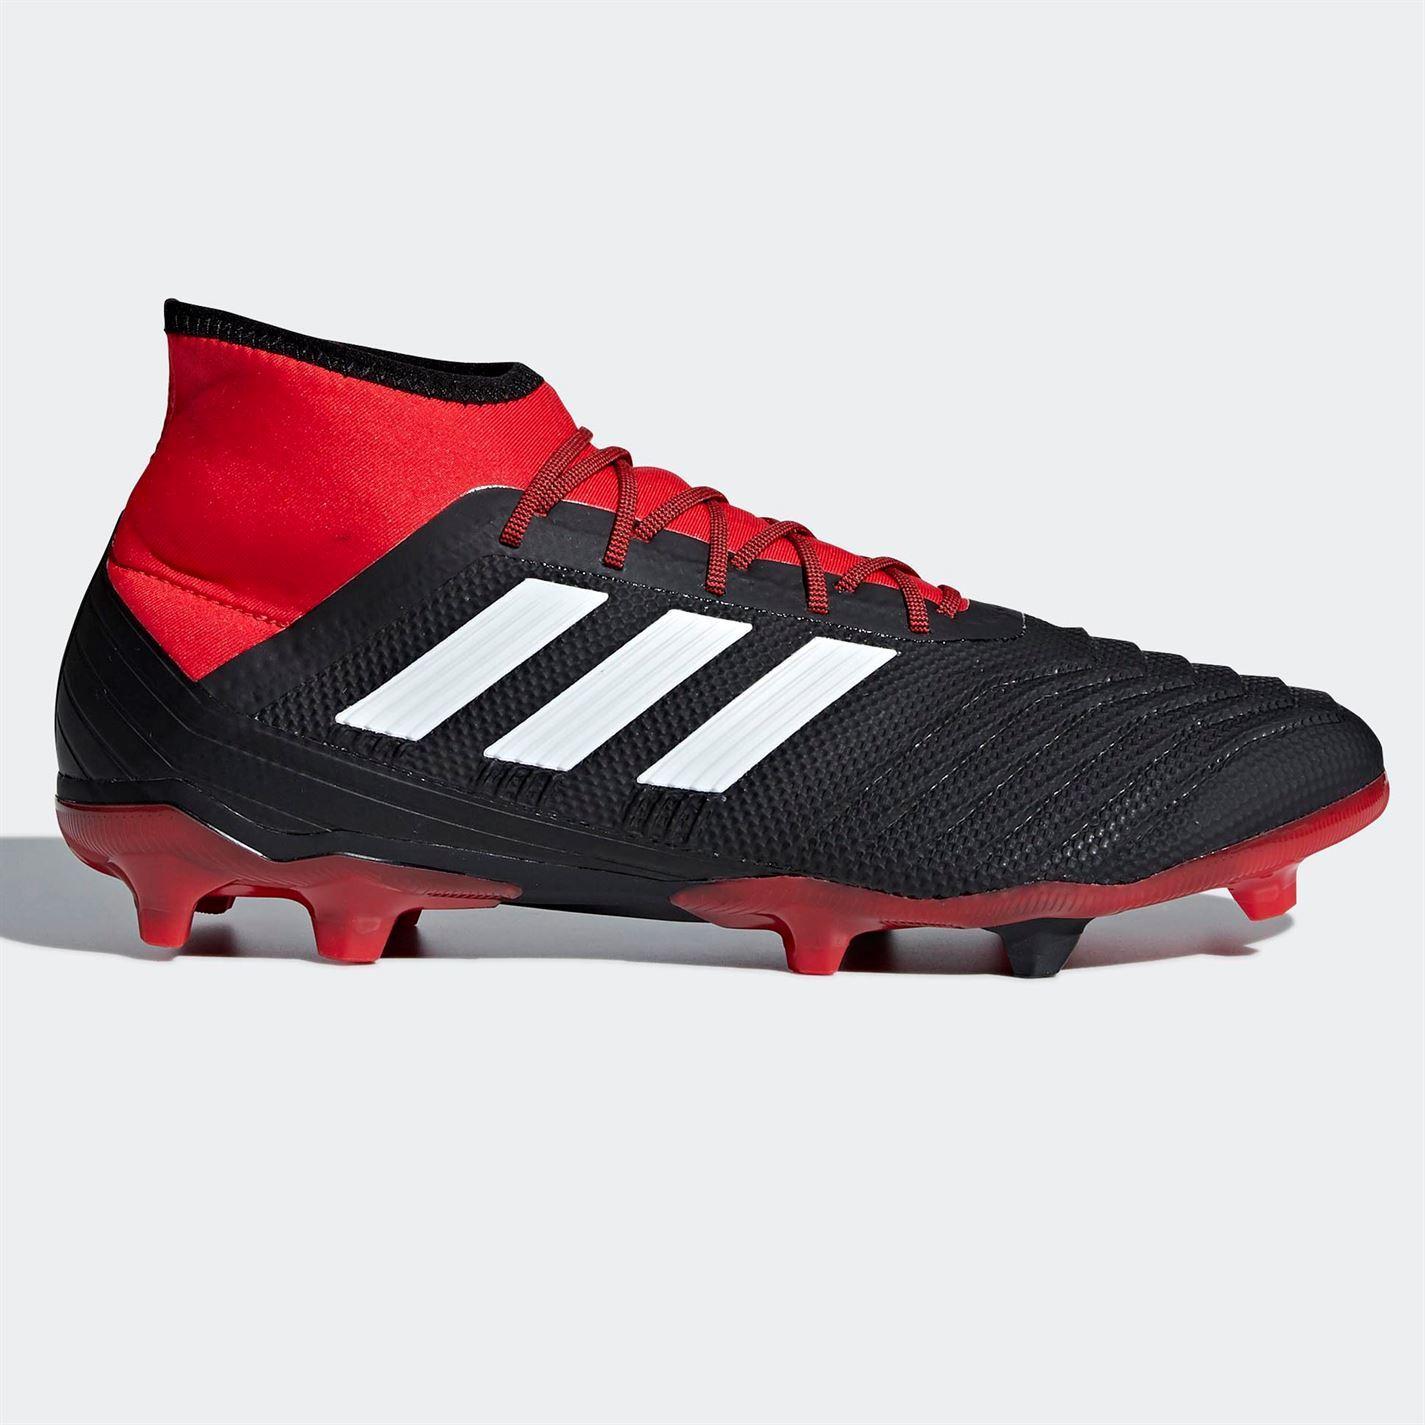 Adidas Homme Predator 18.2 FG Chaussures De Football Ferme Sol Lacets rivets stretch